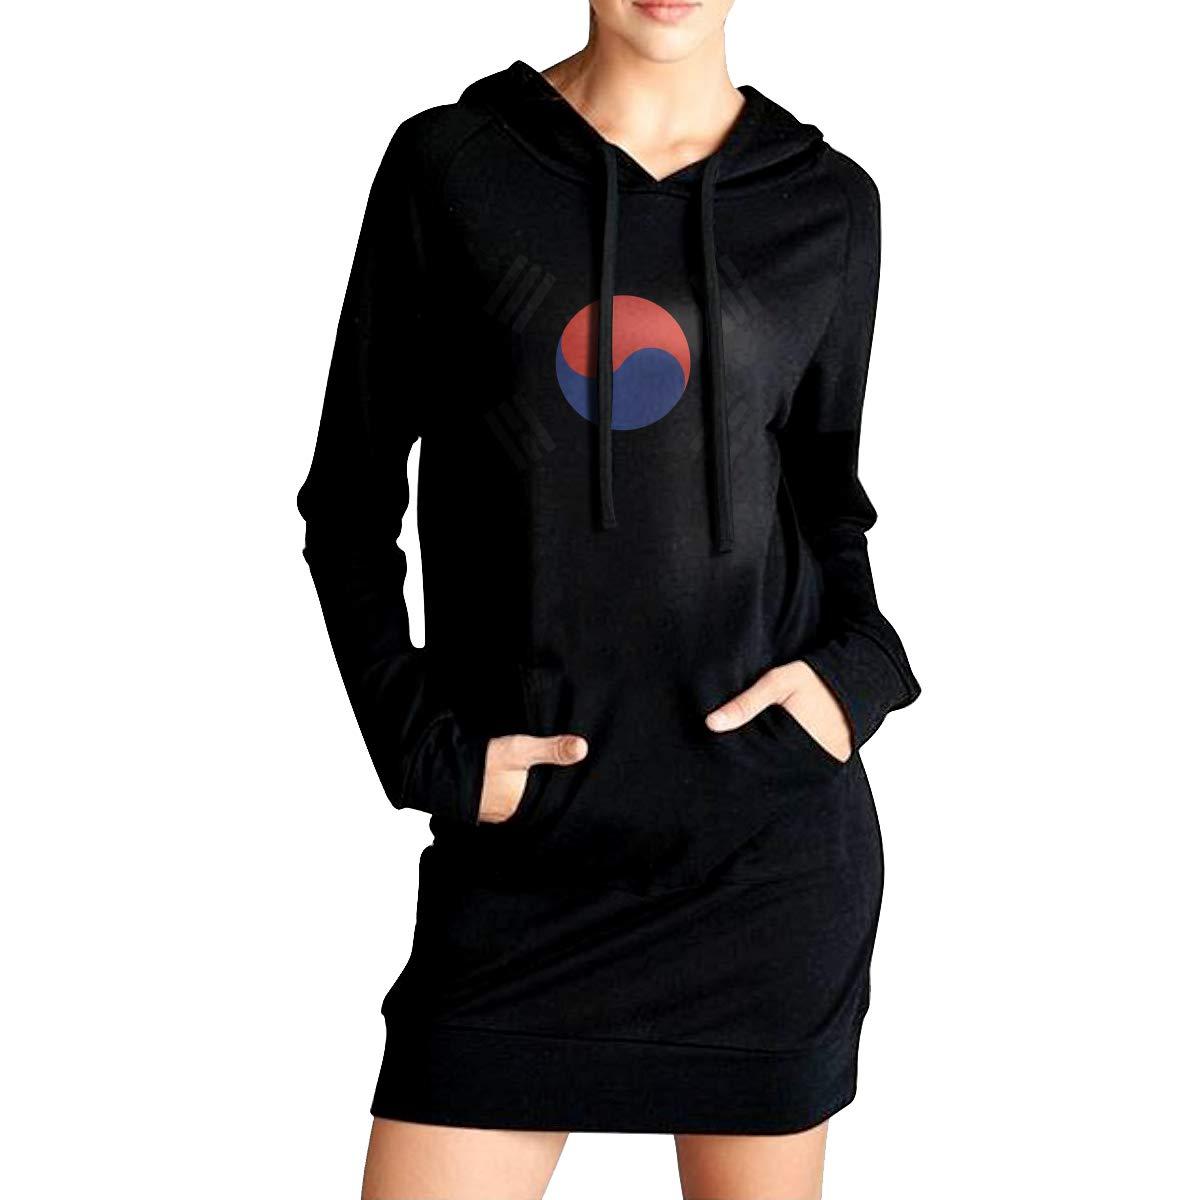 TDYUS DesignName Womens Leisure Black Fleeces With Pocket